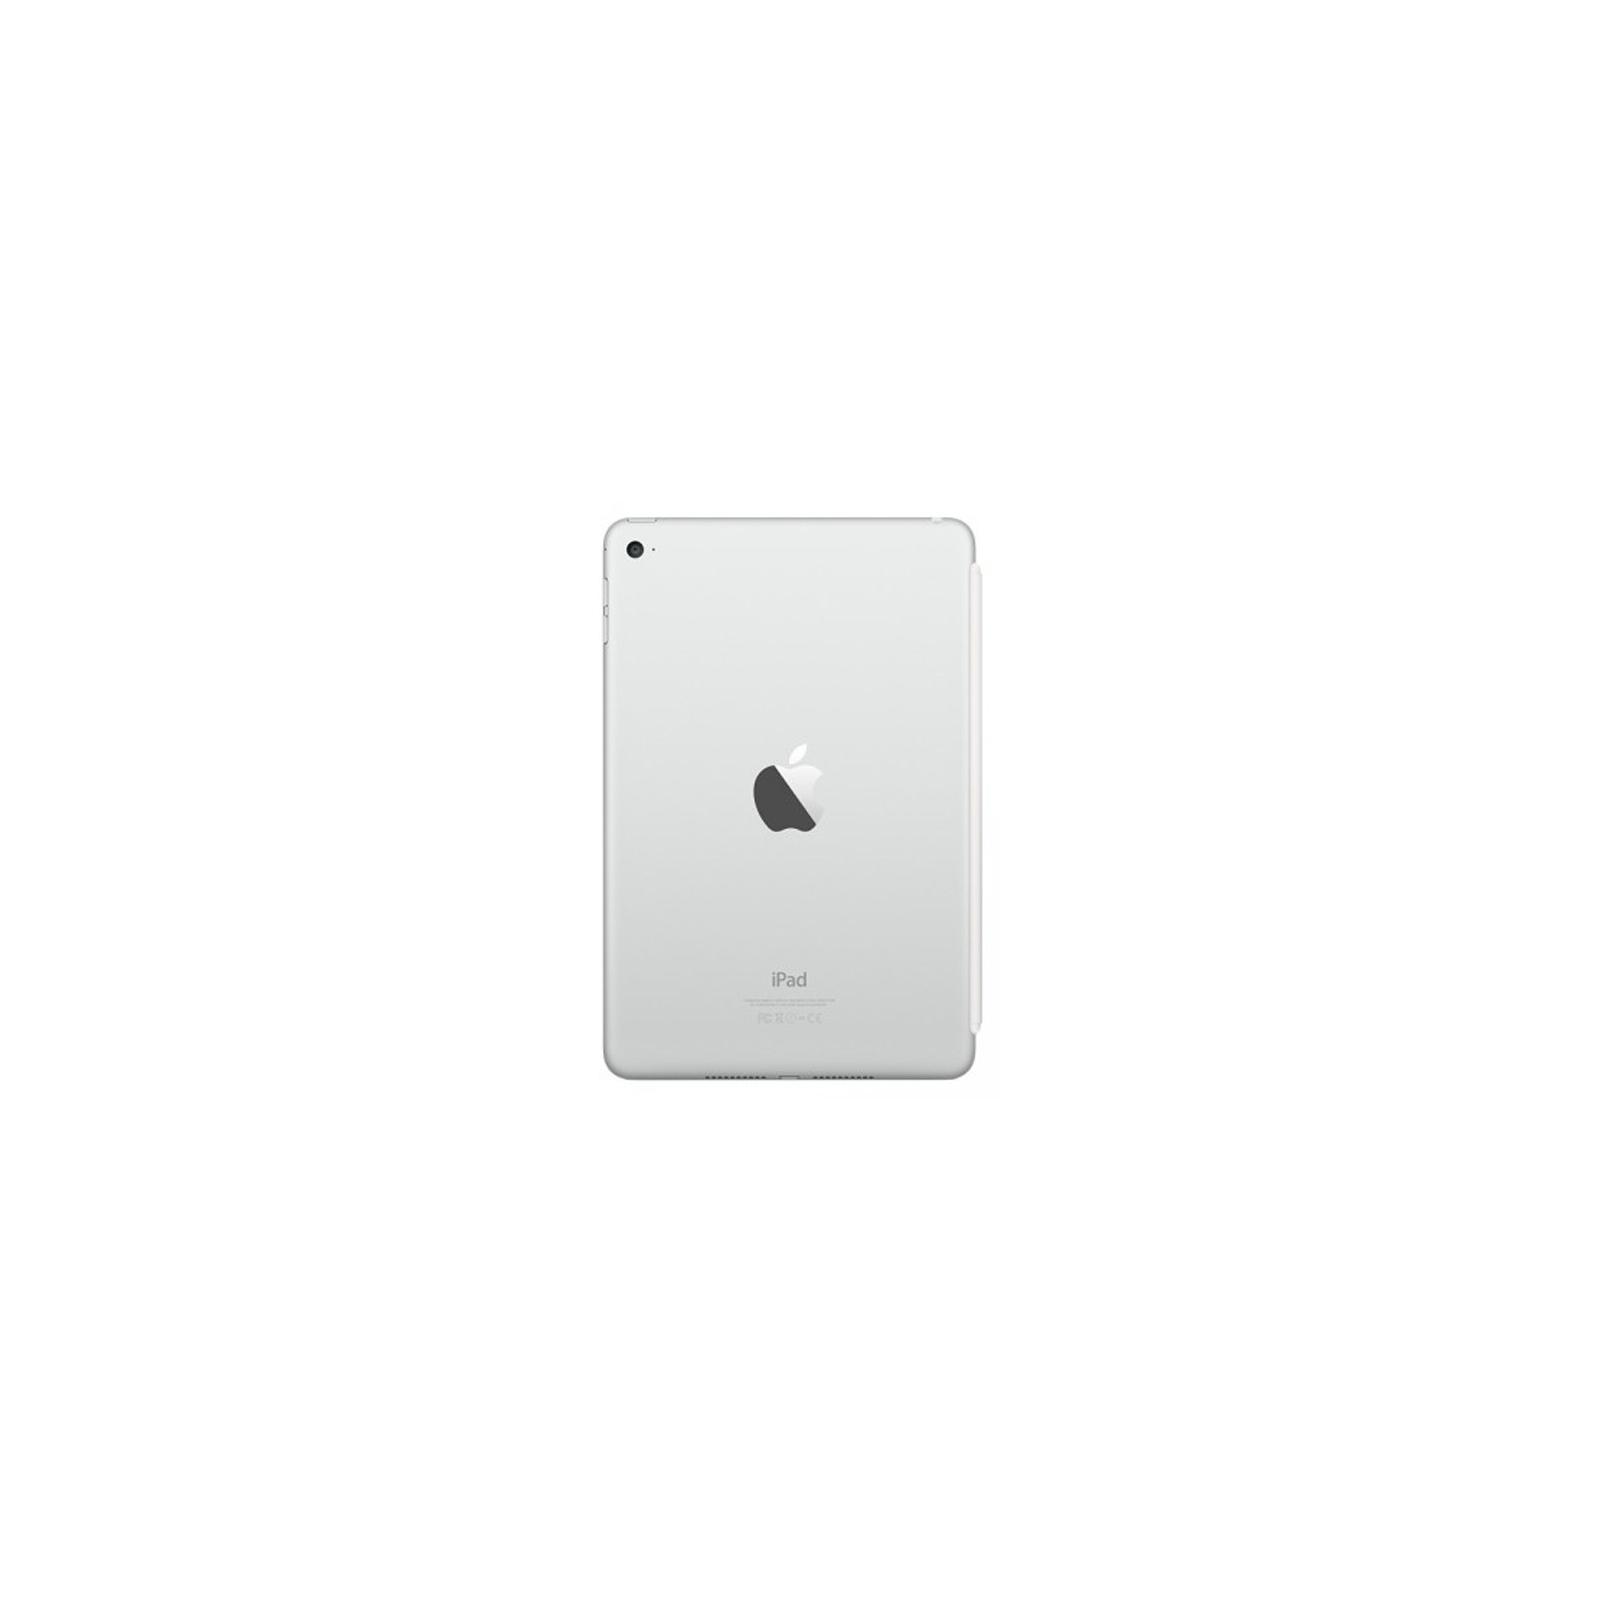 Чехол для планшета Apple Smart Cover для iPad mini 4 White (MKLW2ZM/A) изображение 6